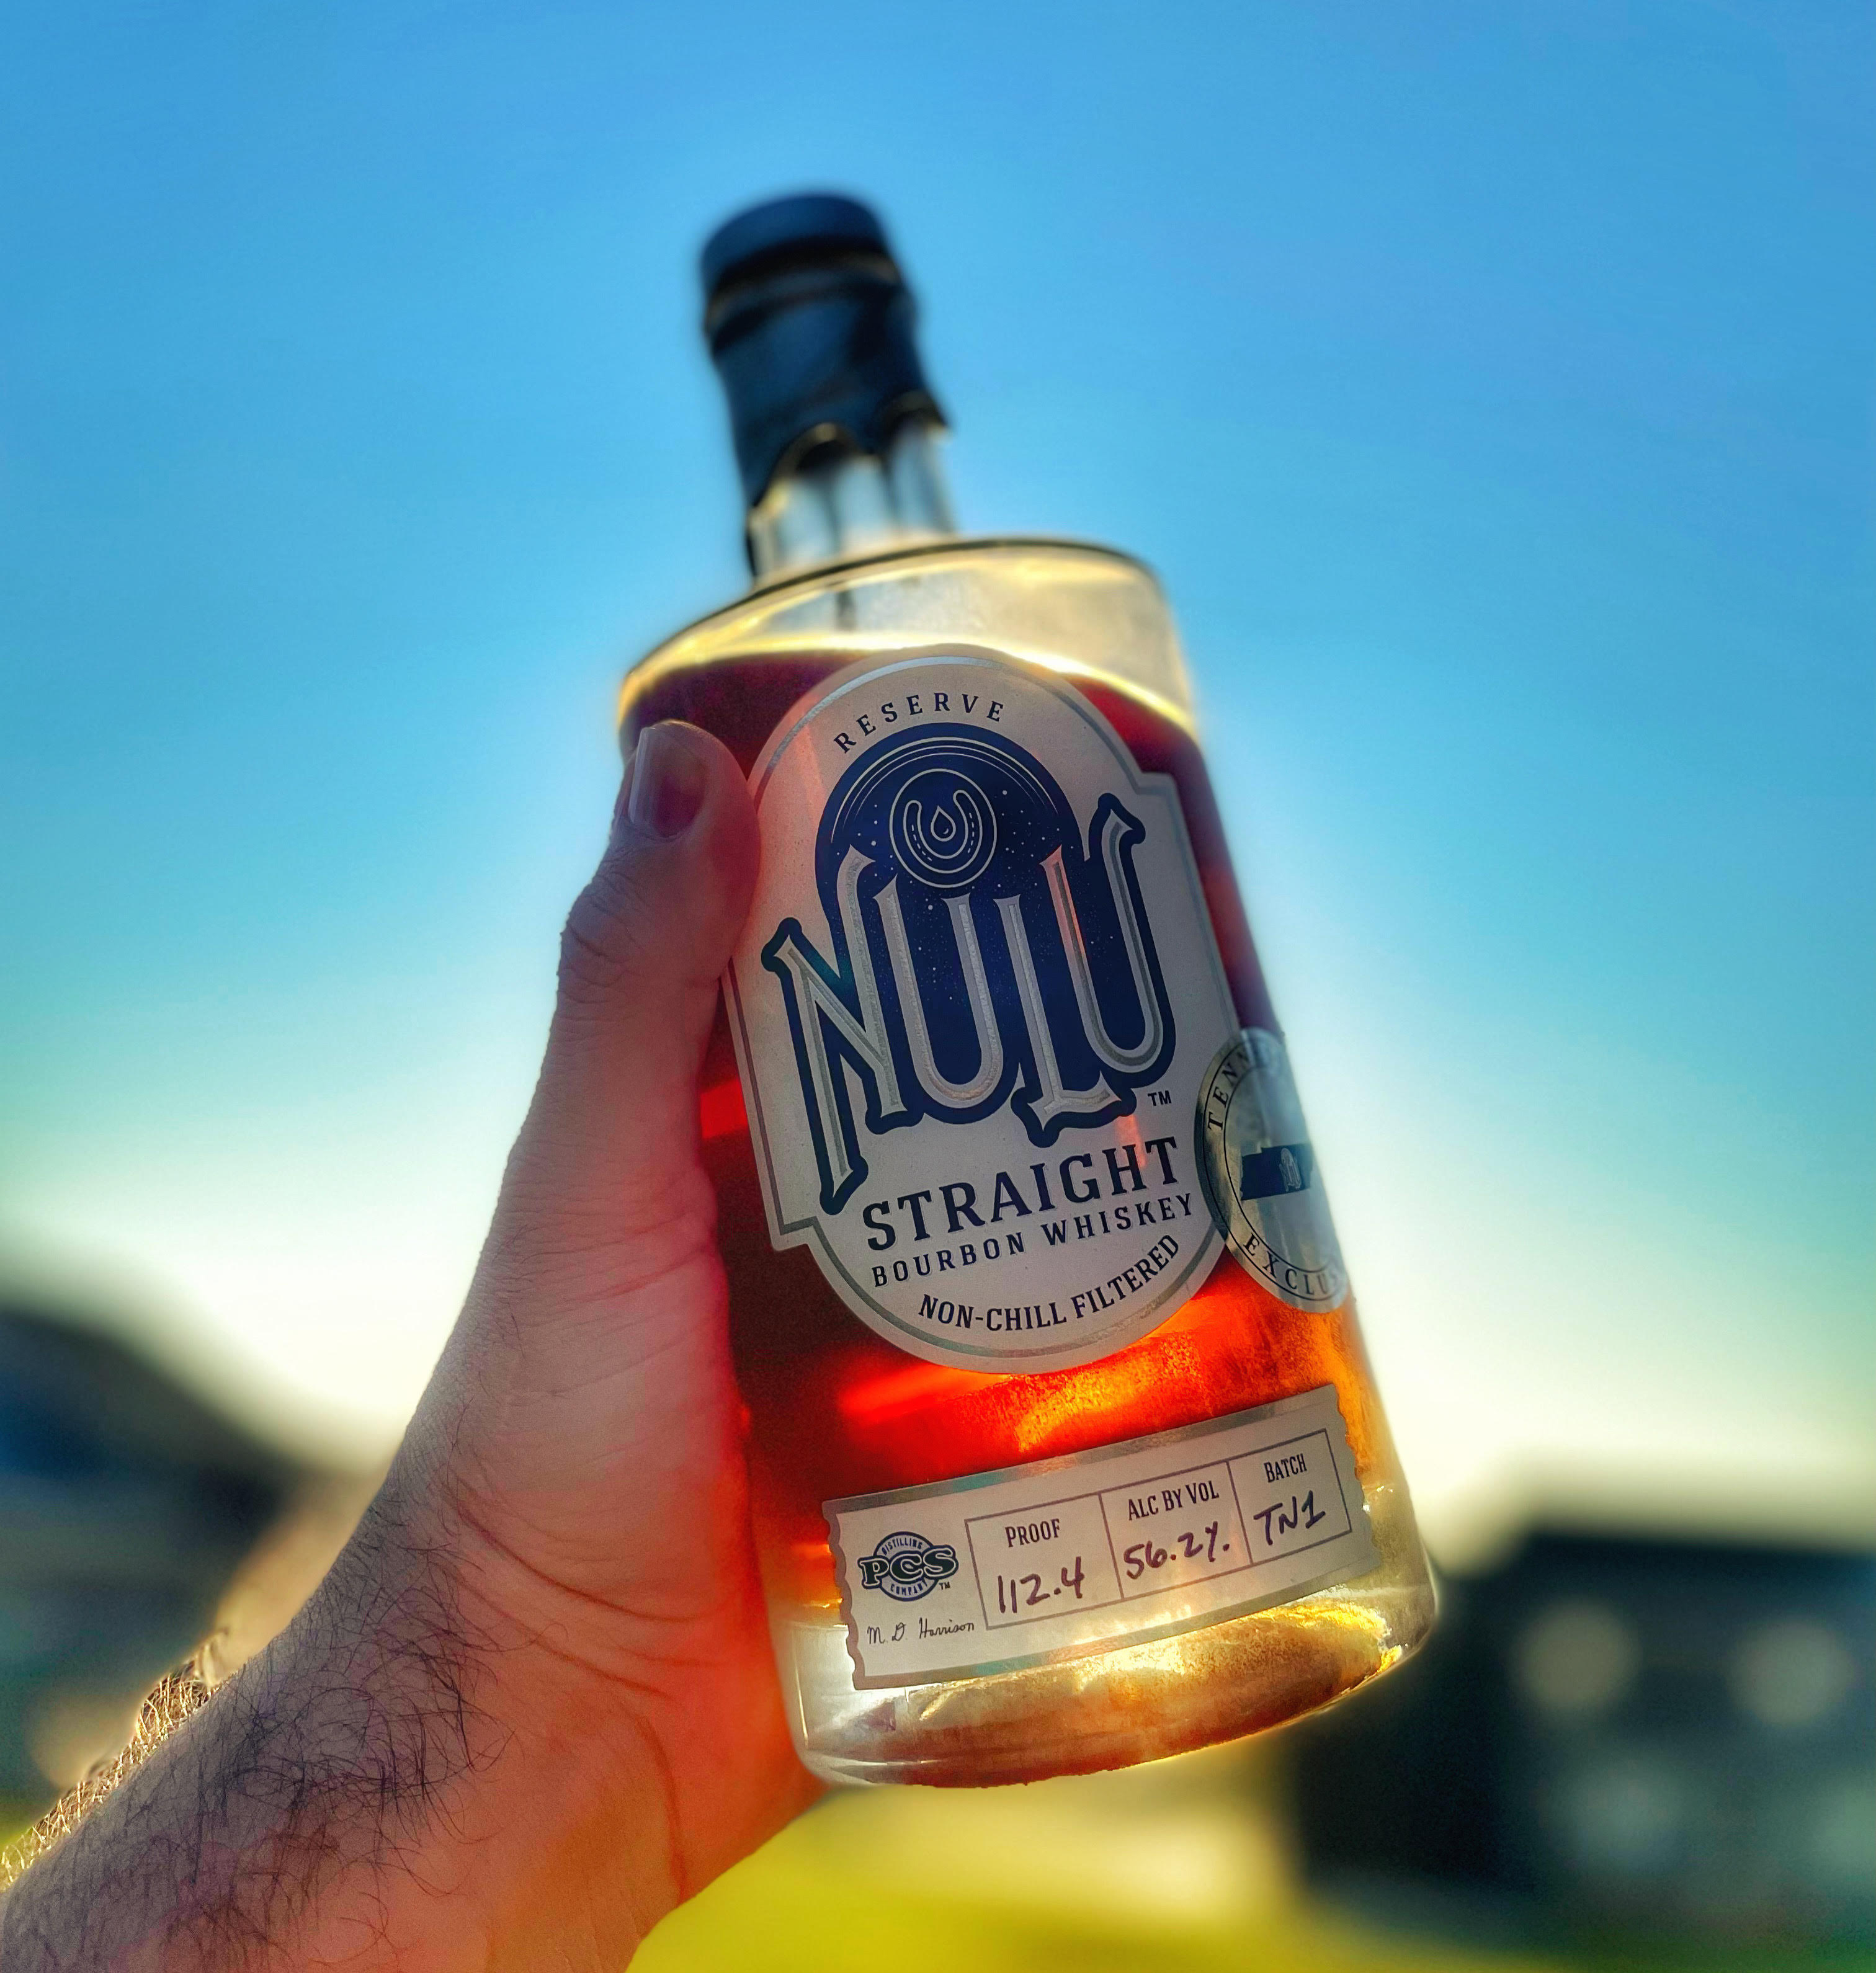 Prohibition Craft Spirits (NULU) with Chase Hazelbaker